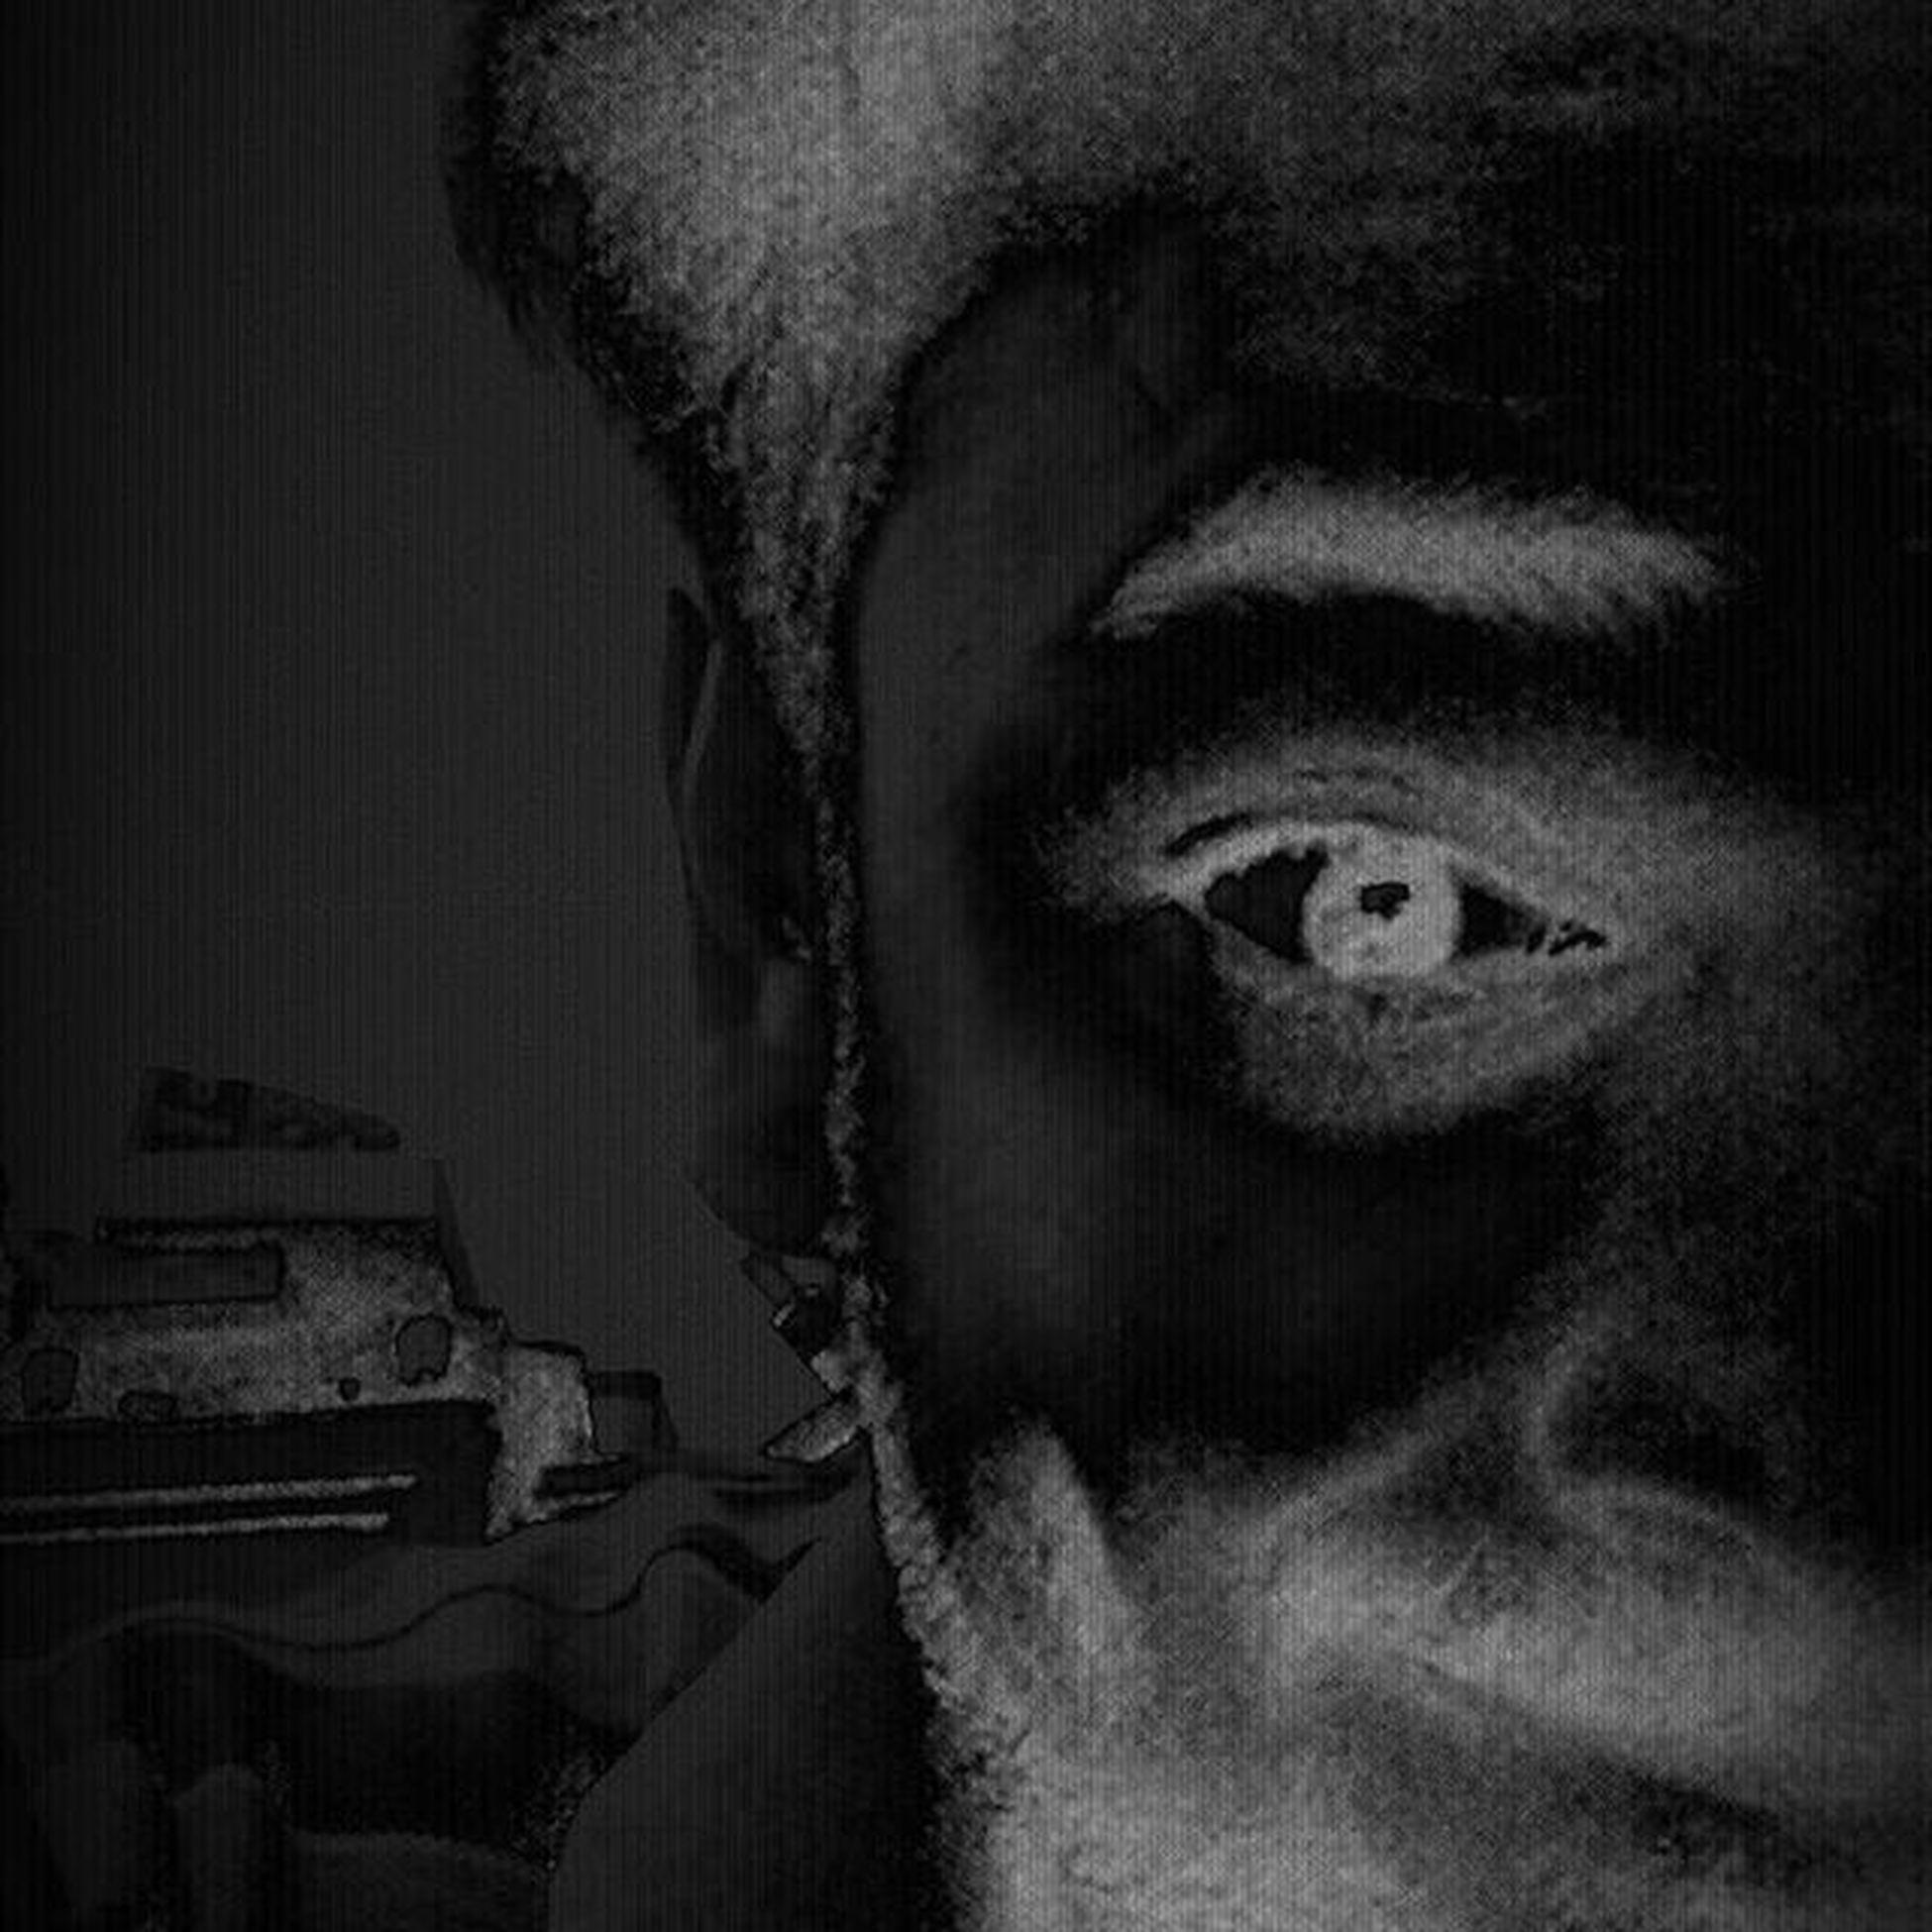 Frankly my dear, I don't give a Damn. Bored Boredom Selfie Selfietime Negative Negatives Negativespace Glow Glowing Eyeforeye Wierd Wierdo Killer Smile Smiles Freaky Freakysmile Igers Igersindia Instagood Chillin Beard Beardnation Beardon Beardsquad moustachemoustachesdevildevileyes